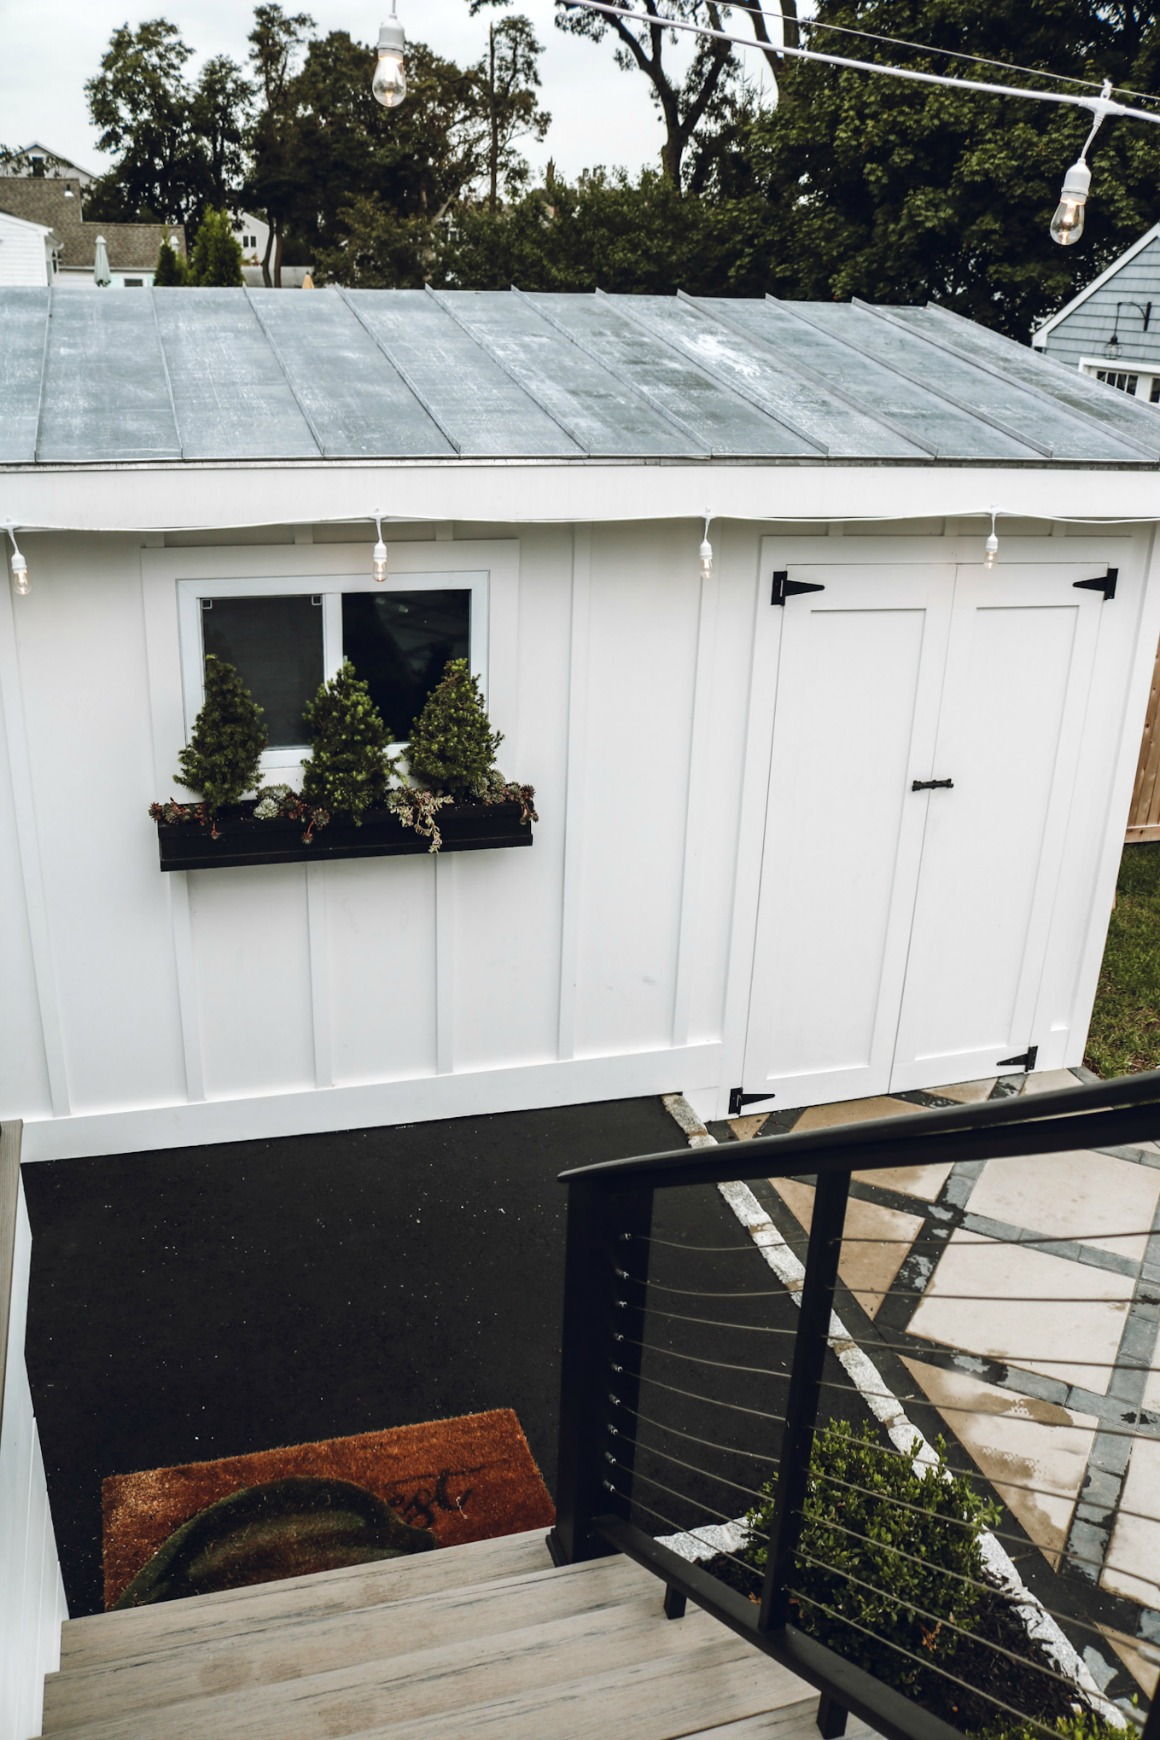 Garbage Storage, Bike Storage, Backyard storage solutions